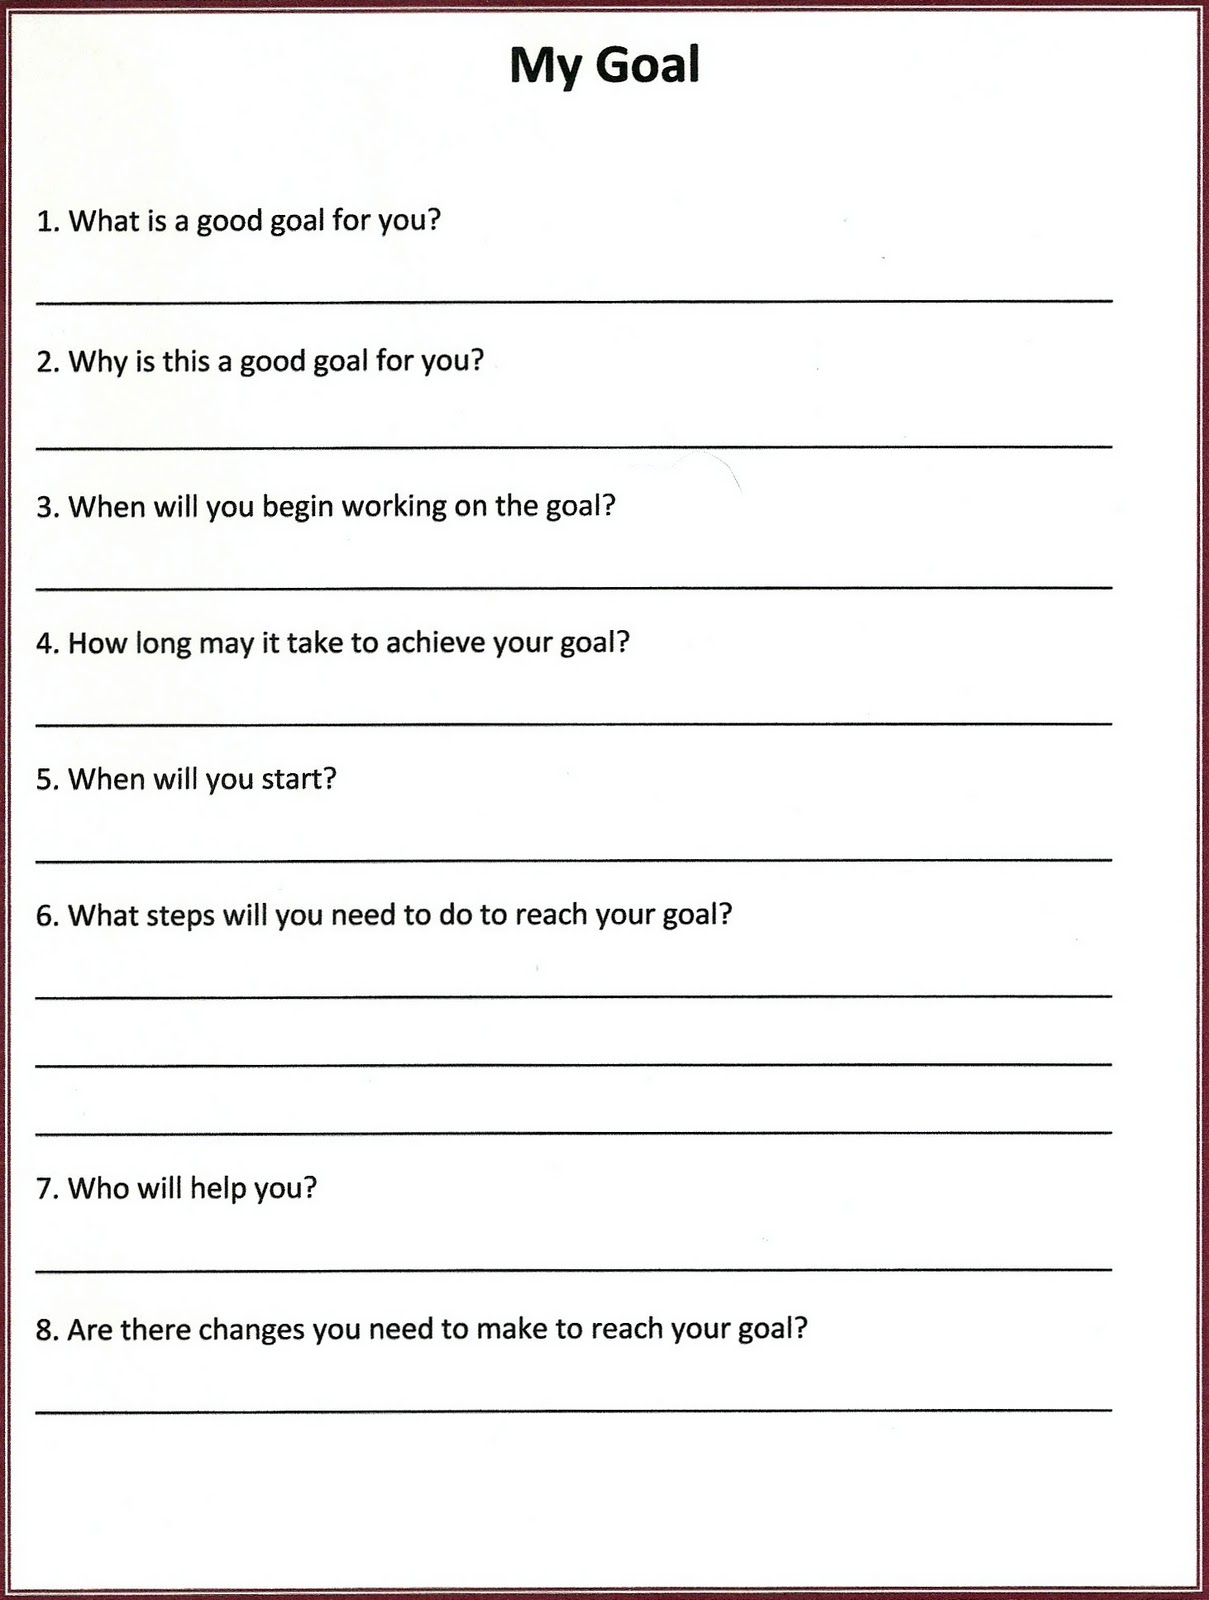 Dbq essay tips for sat